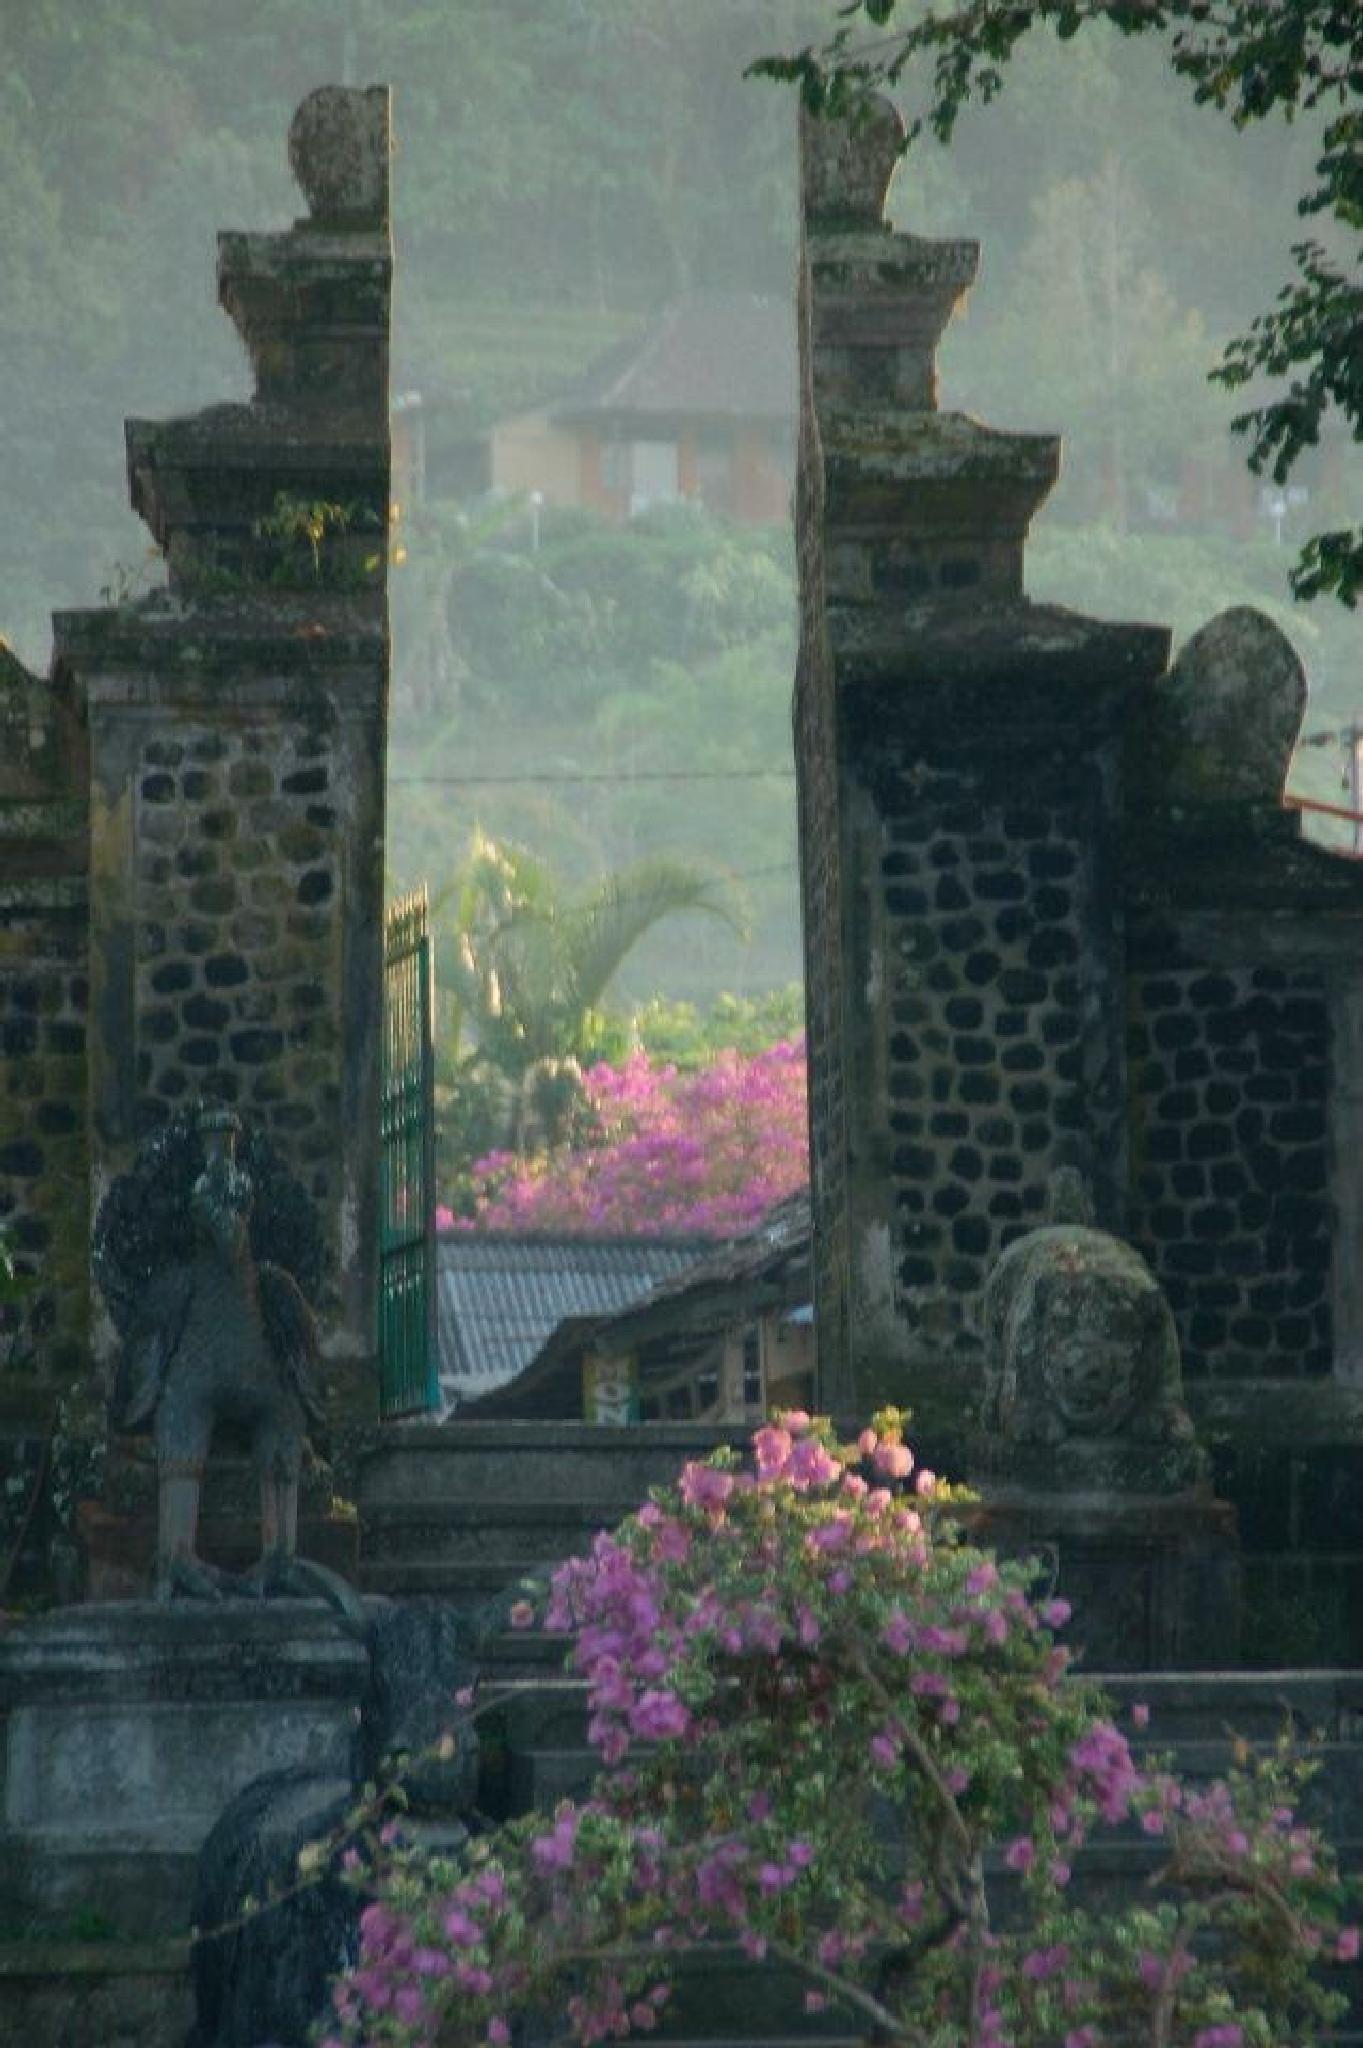 Bali Bliss by alana.cini